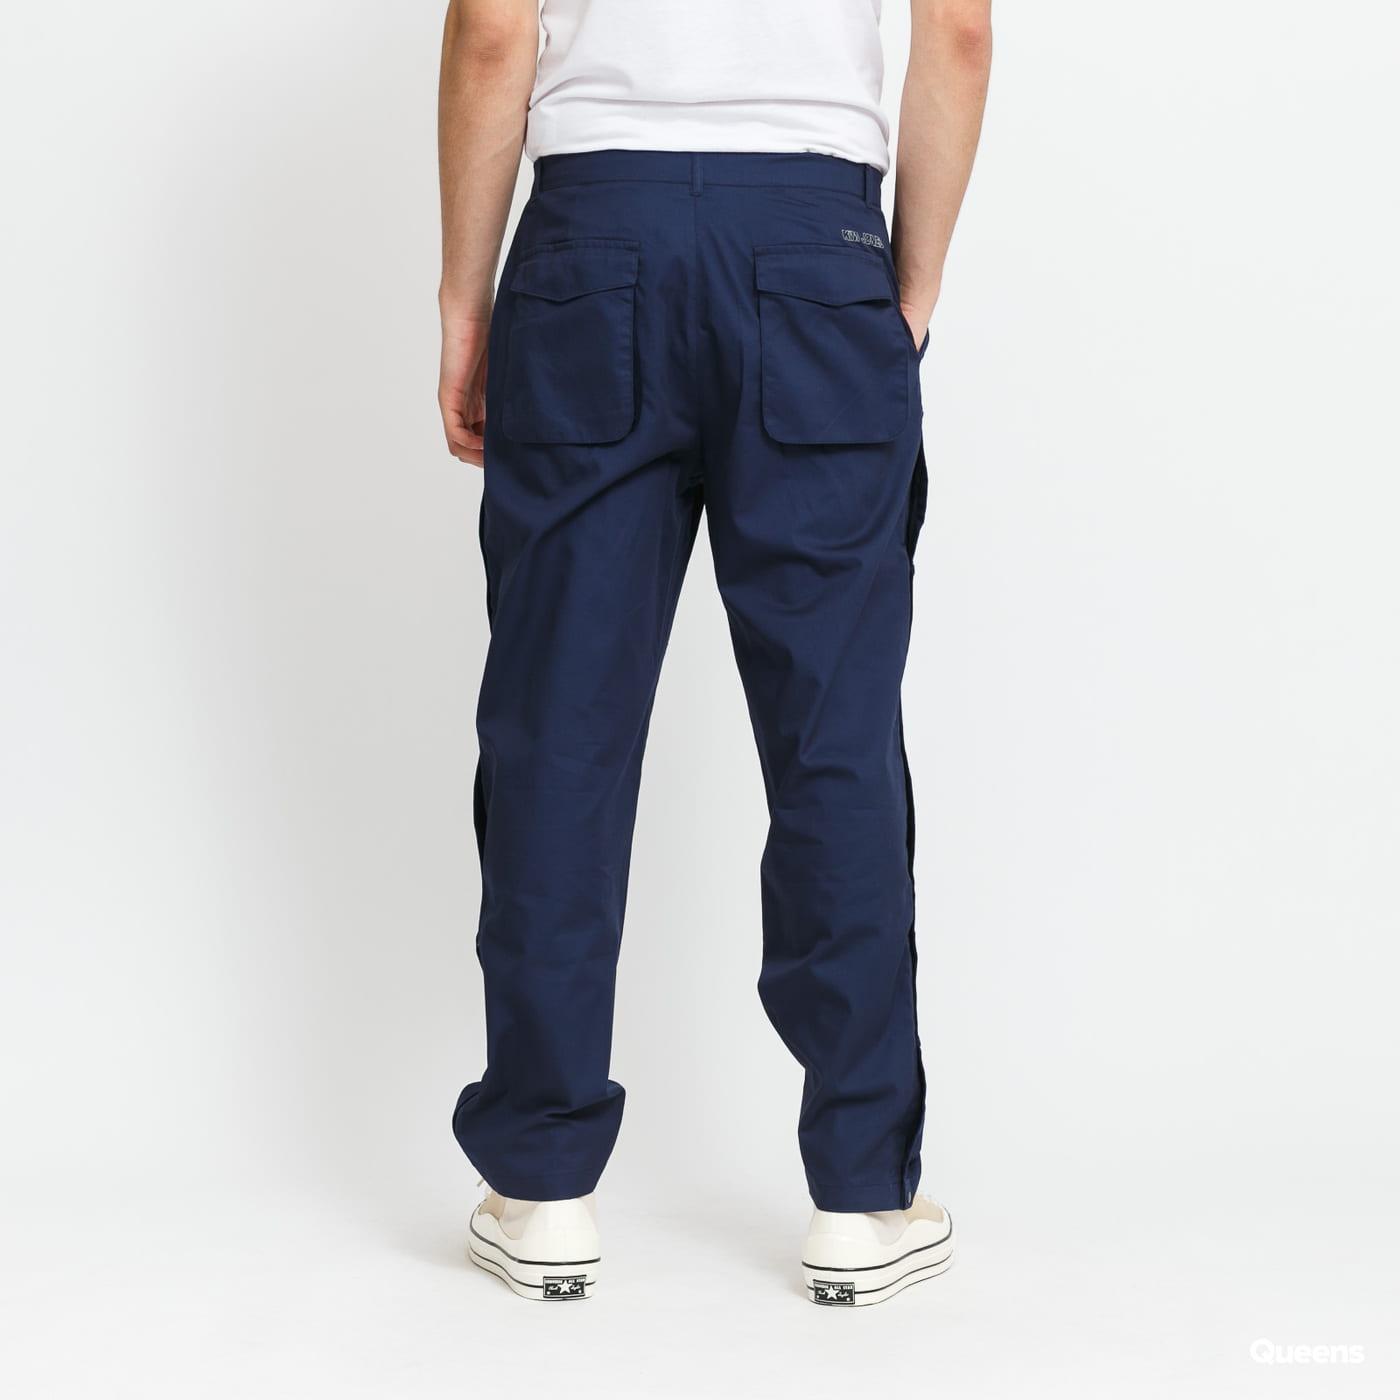 Converse Kim Jones Cargo Pants blue / turquoise